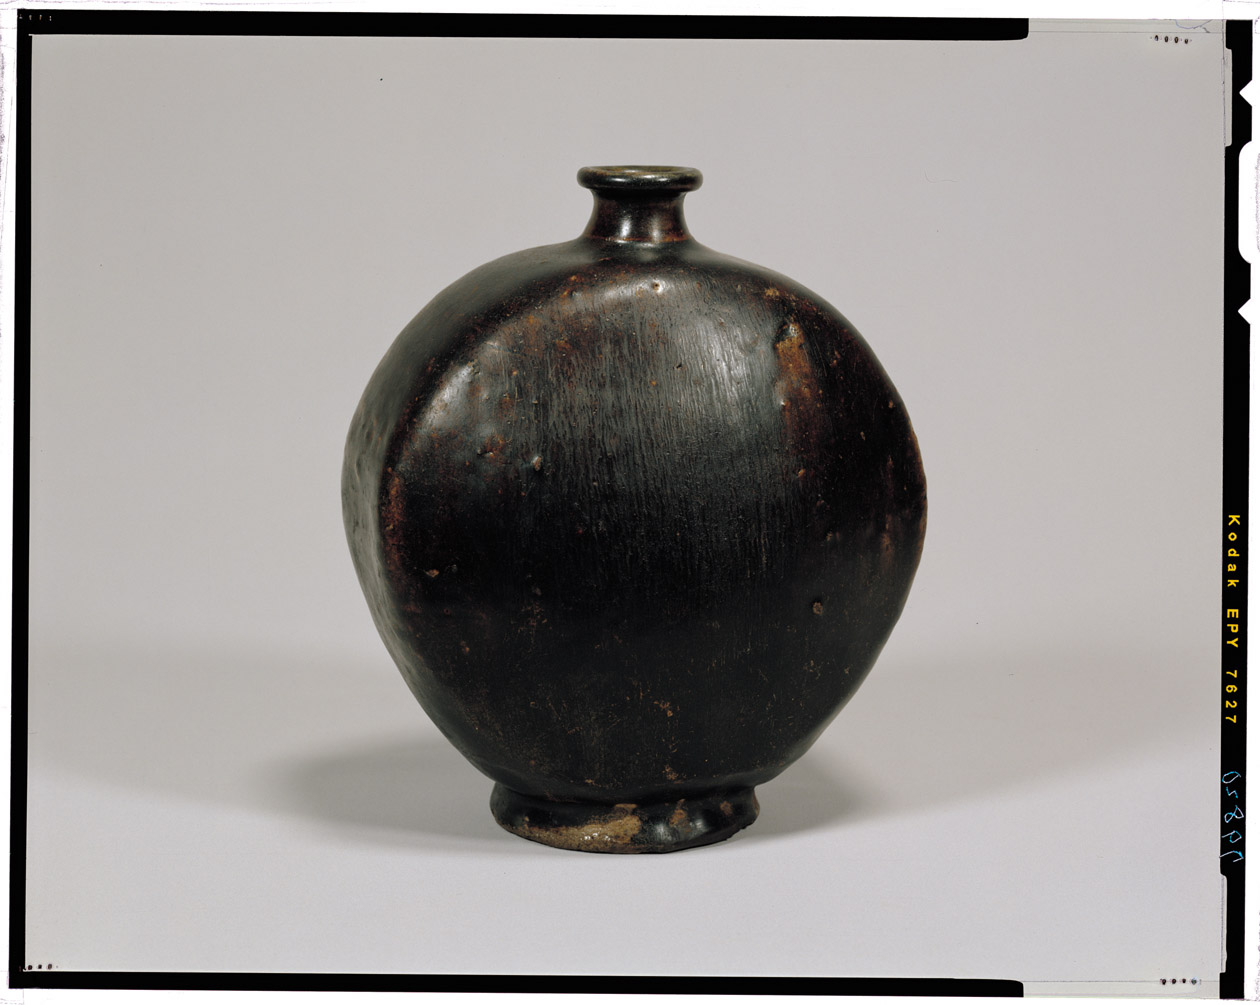 zh 黒釉扁壺 朝鮮半島の古陶磁 15-16C